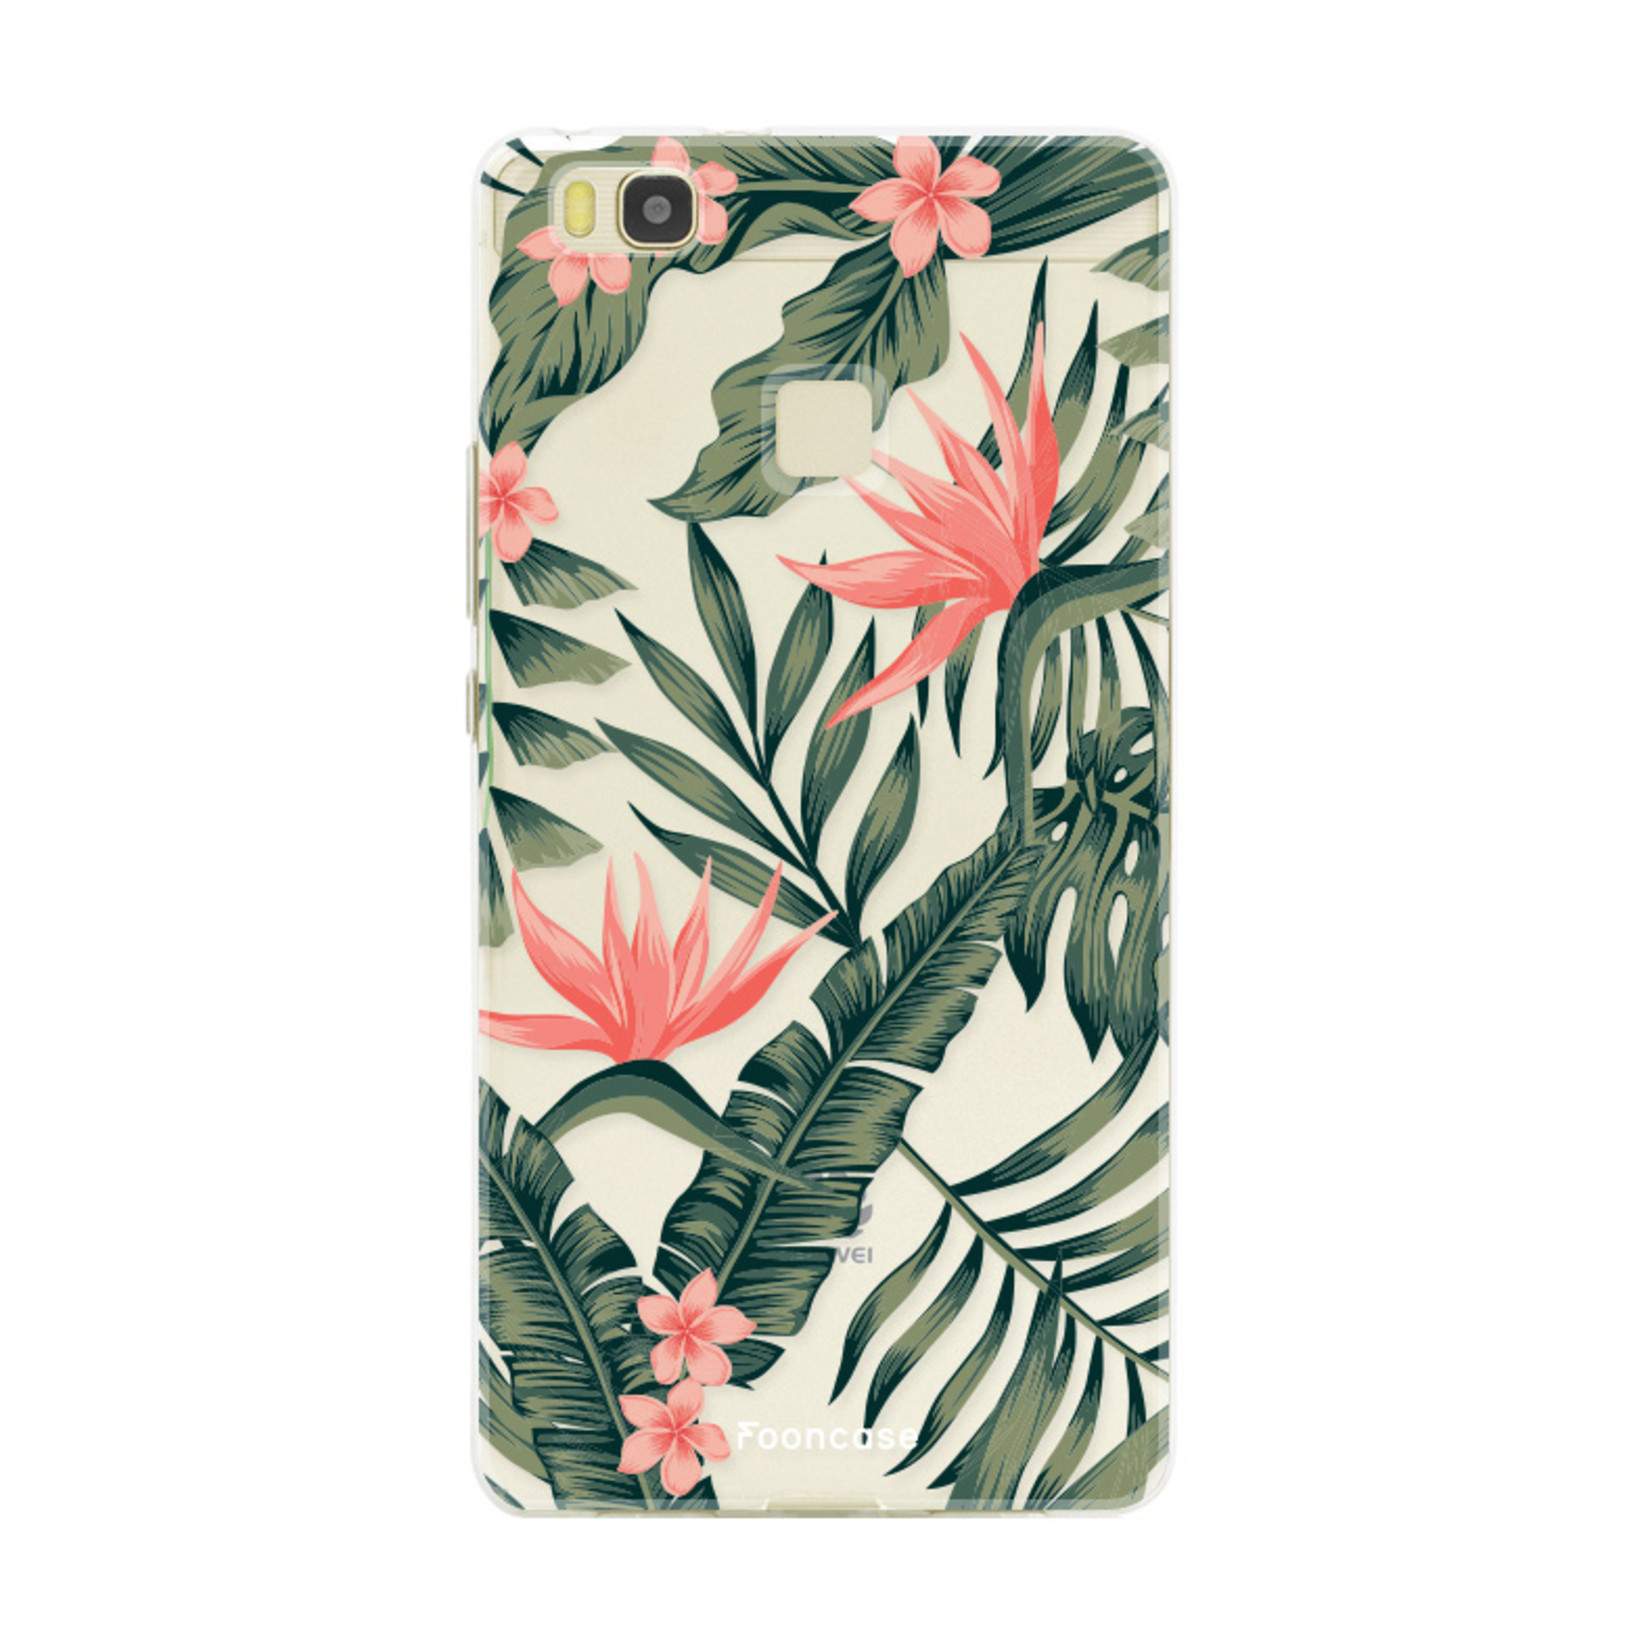 FOONCASE Huawei P9 Lite hoesje TPU Soft Case - Back Cover - Tropical Desire / Bladeren / Roze